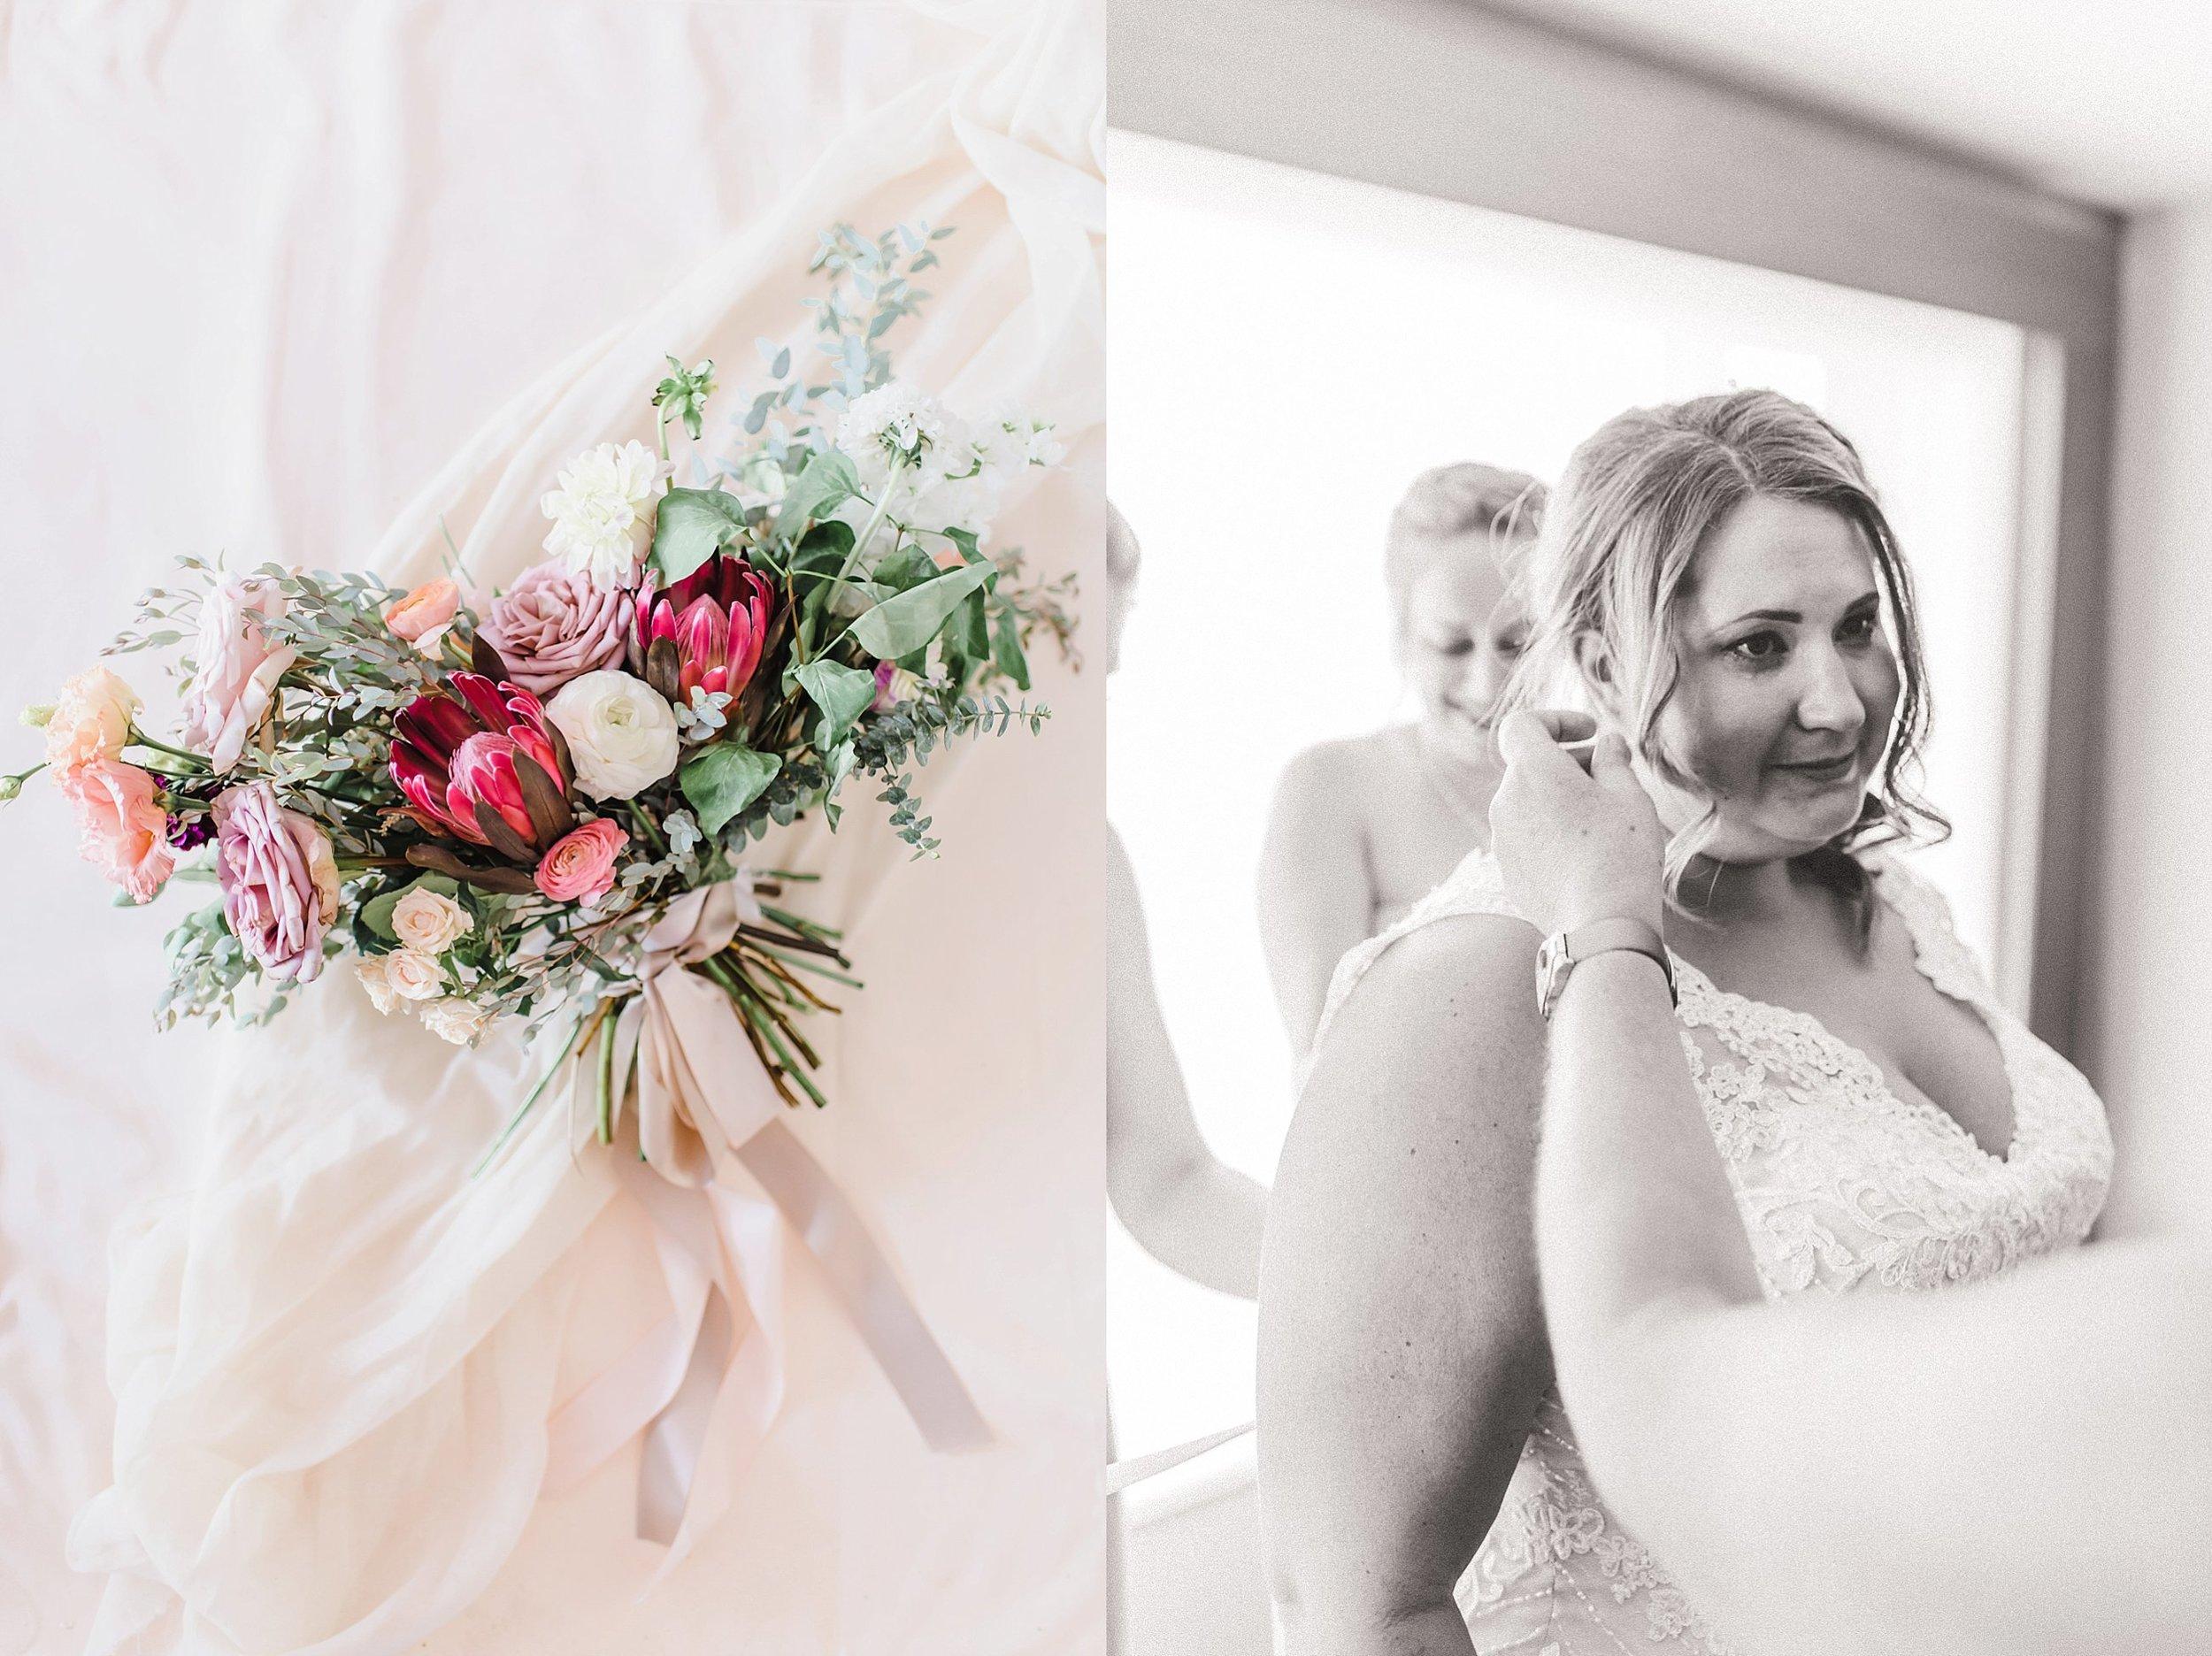 light airy indie fine art ottawa wedding photographer | Ali and Batoul Photography_0343.jpg